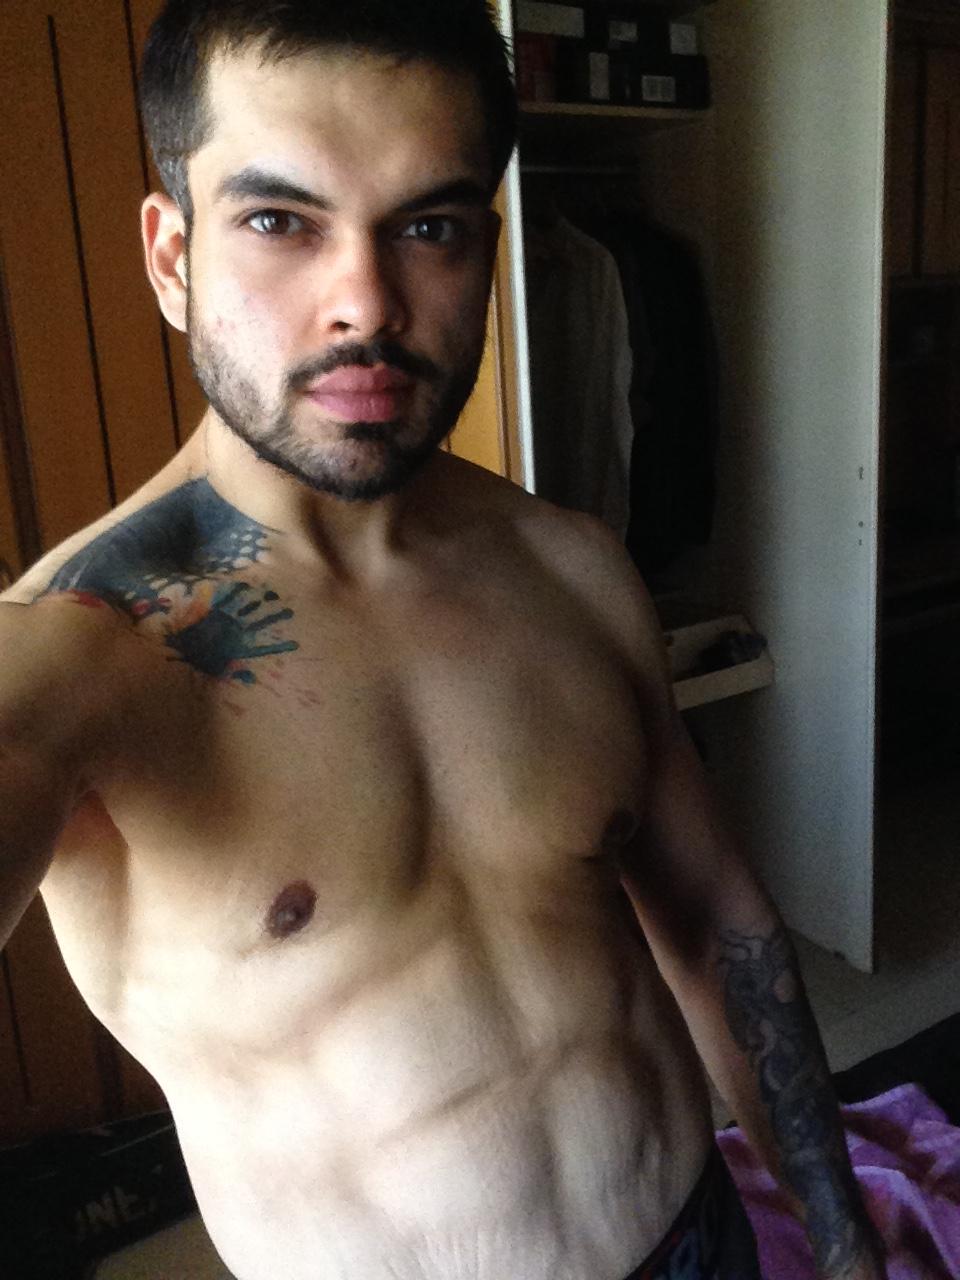 naynesh chainani weight loss of 76kg story